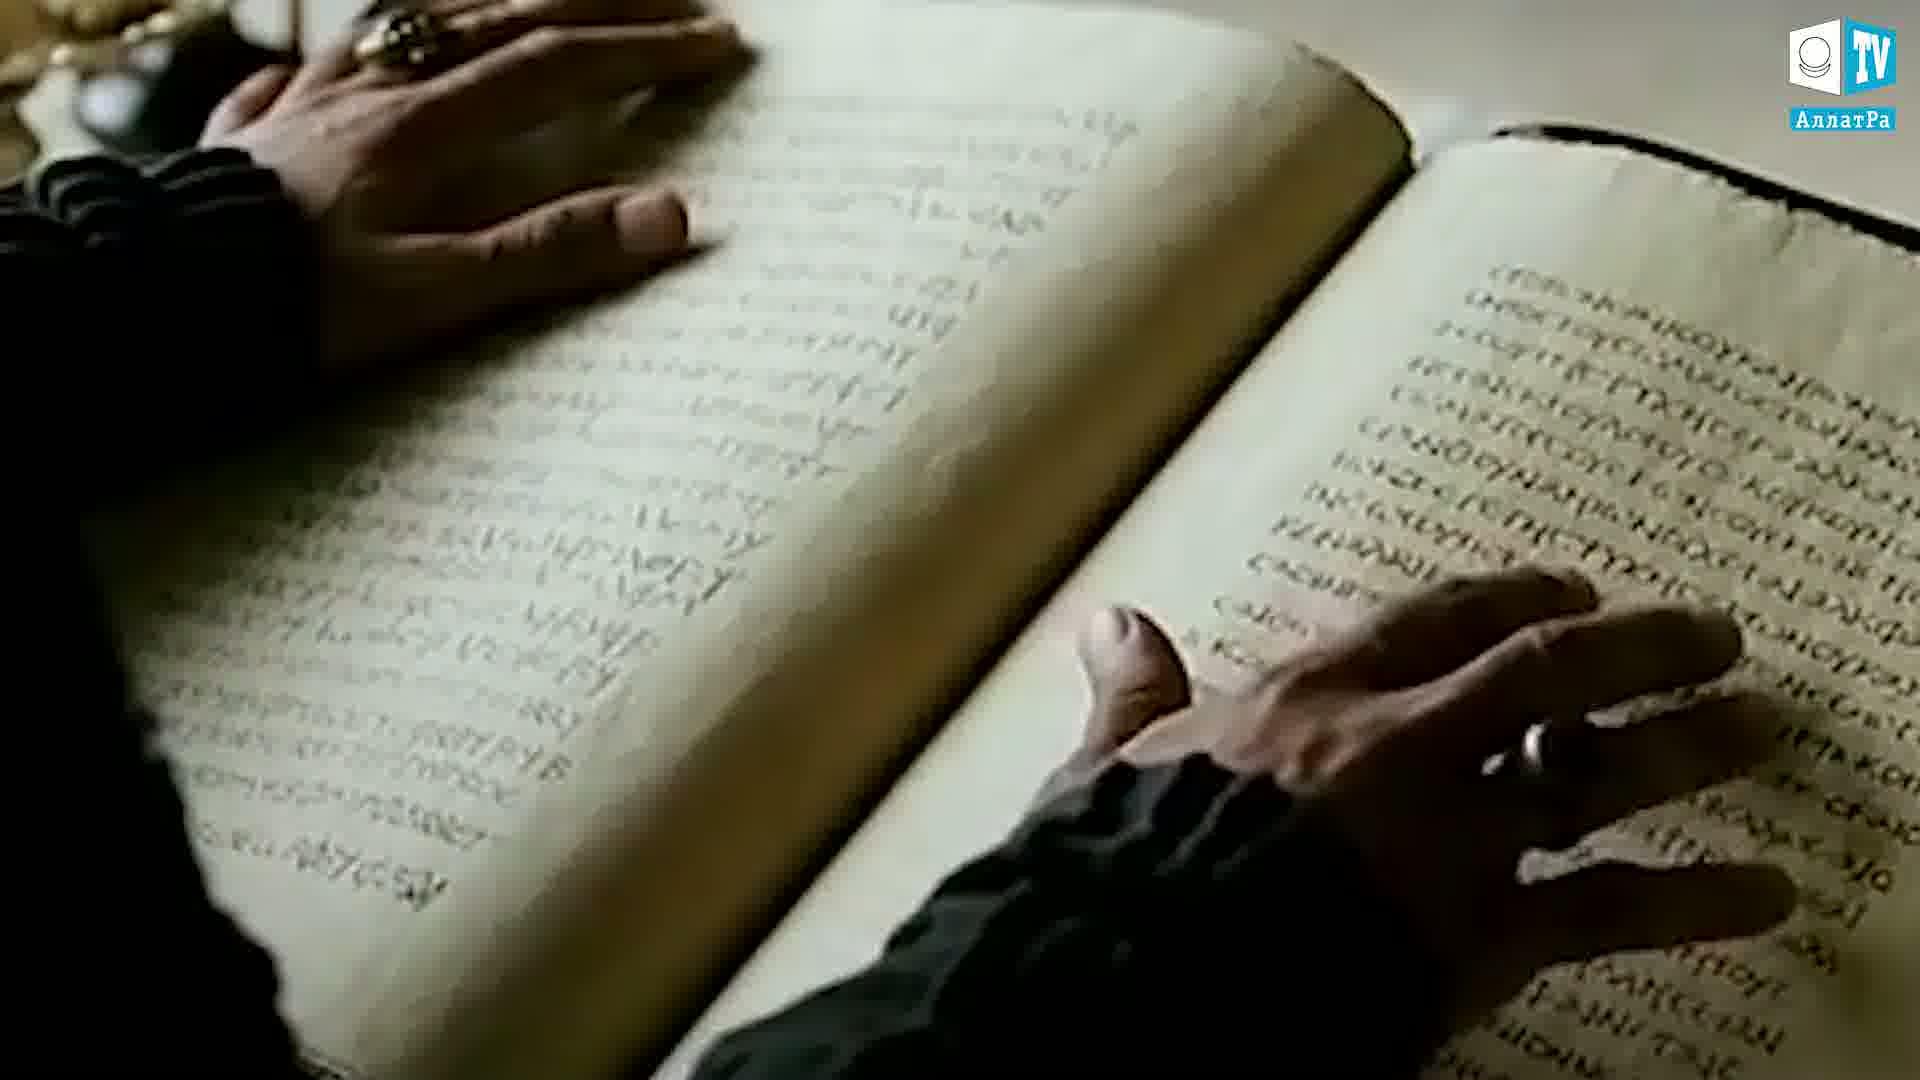 Starodávné texty 6. Foto